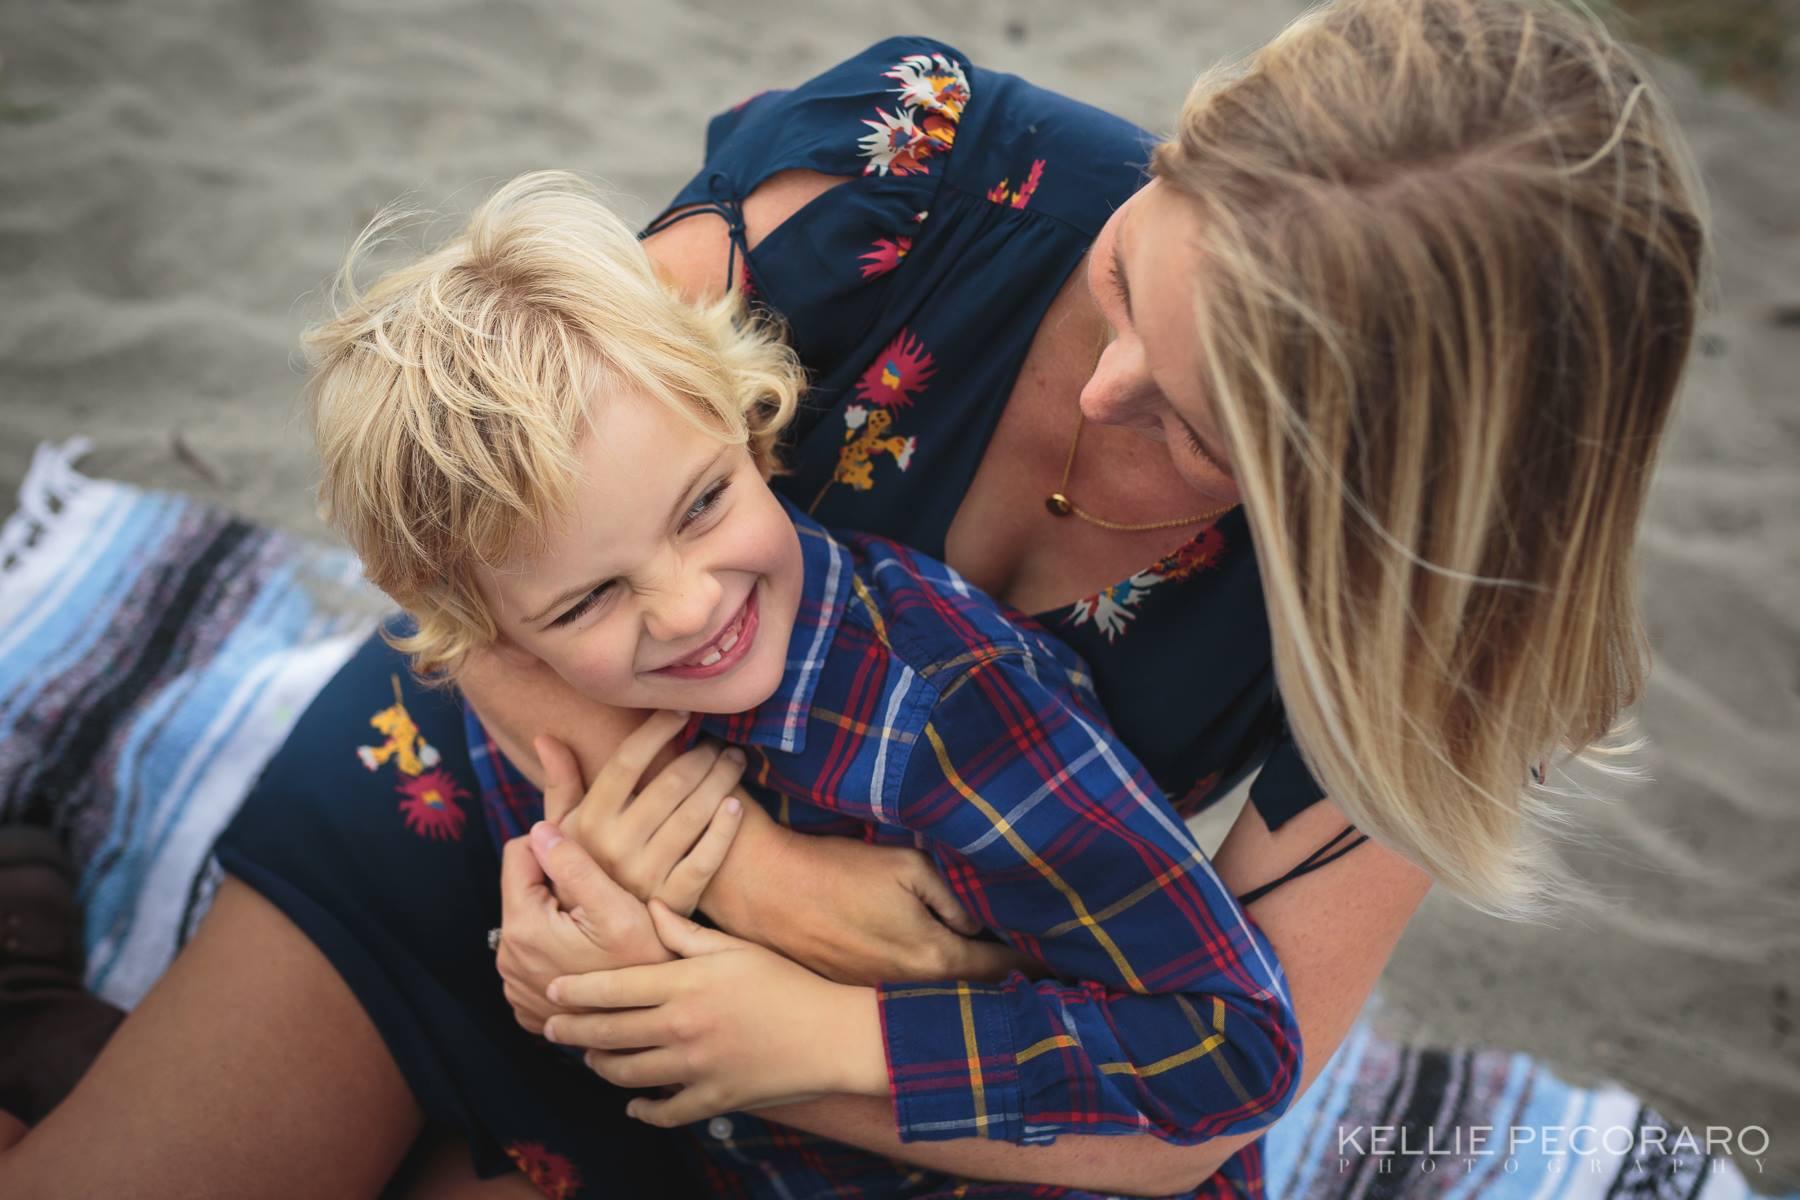 kellie pecoraro beautiful connected emotive family photography posing mother son beach